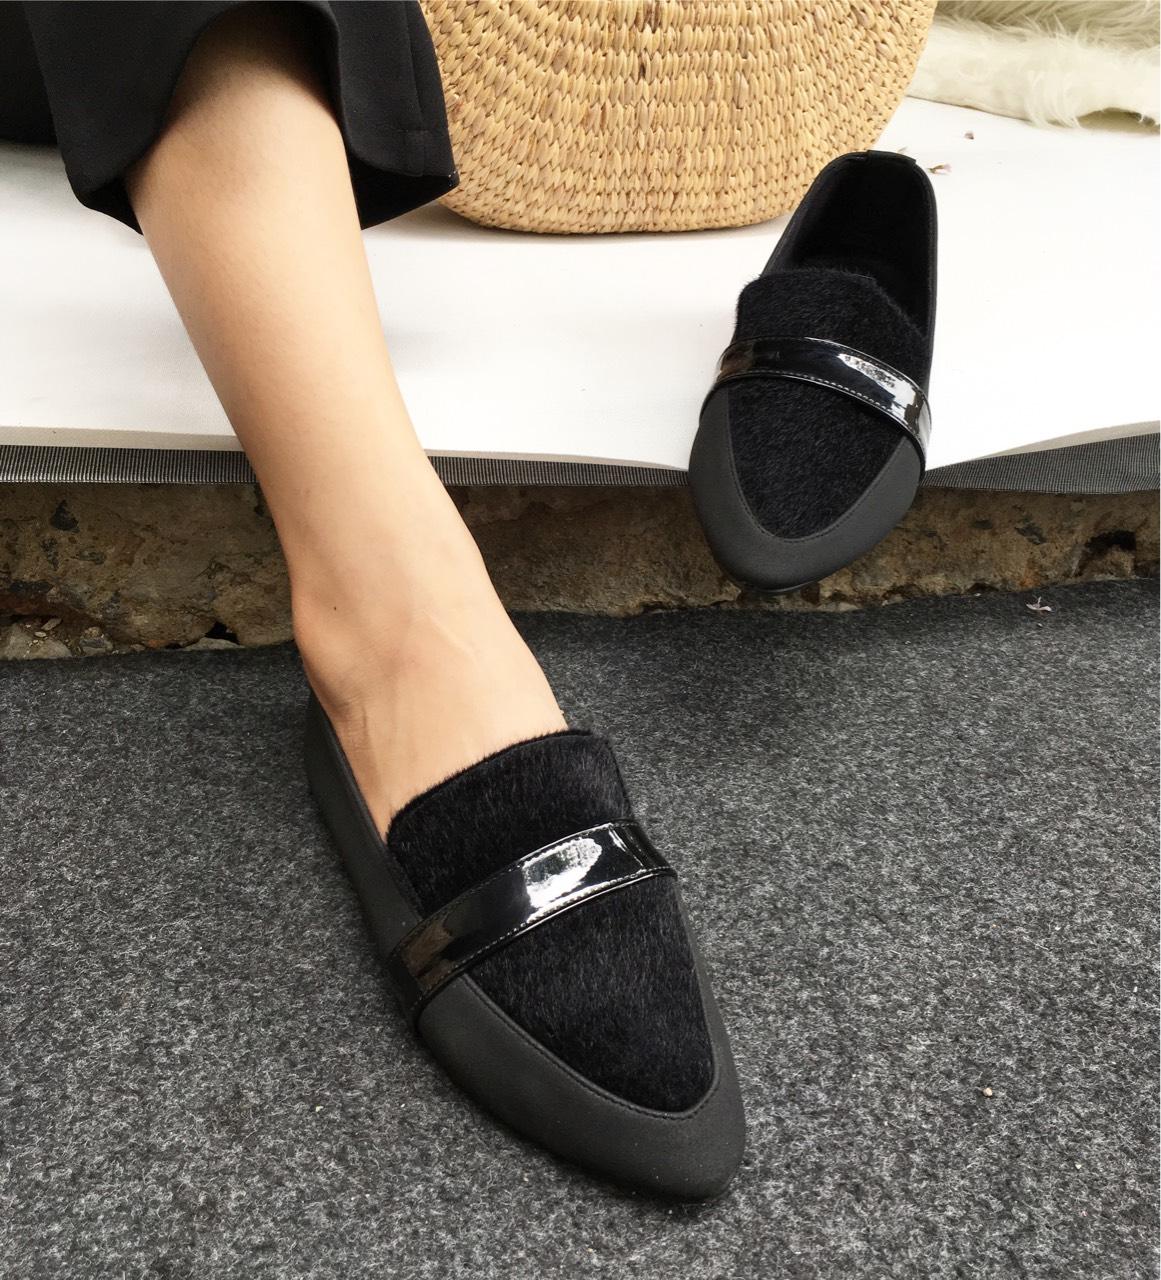 Haxhummer,นิ่มใส่สบายมากกกกกกกก,shoesfashion,shoes,รองเท้าคัชชู,รองเท้าใส่ทำงาน,รองเท้านิ่ม,Whiteoakshoes